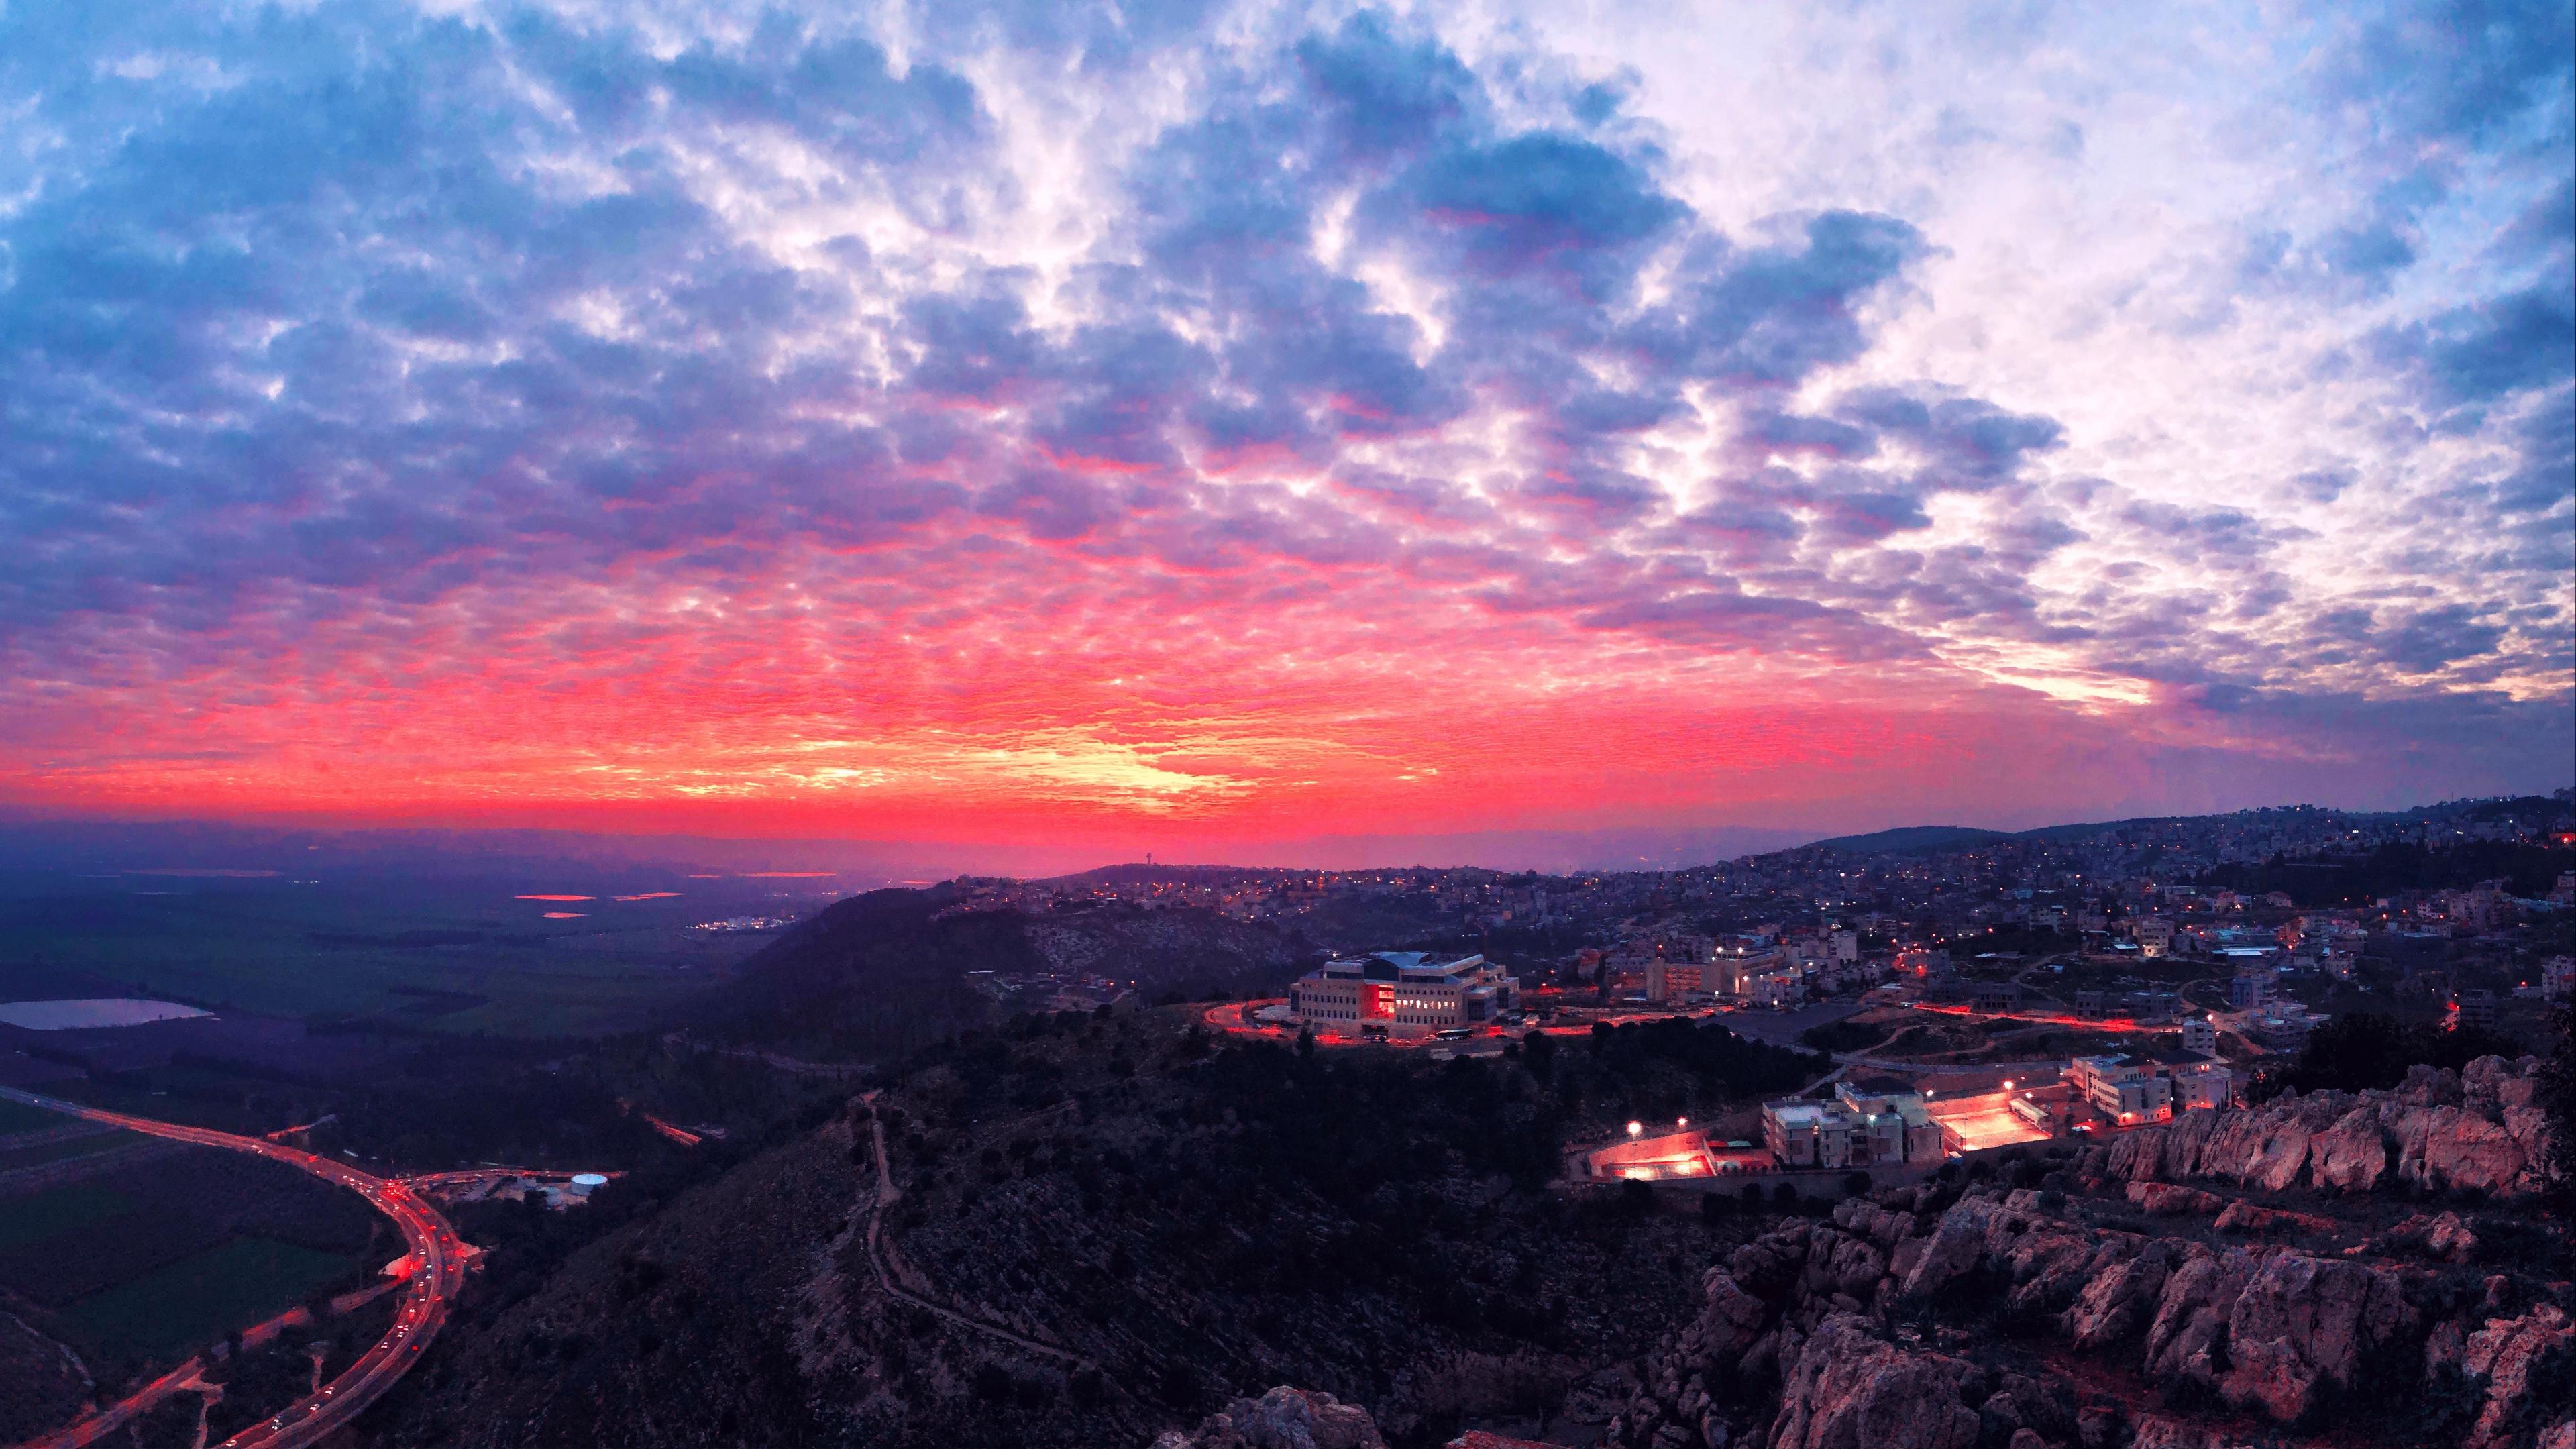 city evening sunset sky uplands 4k 1538068130 - city, evening, sunset, sky, uplands 4k - sunset, Evening, City